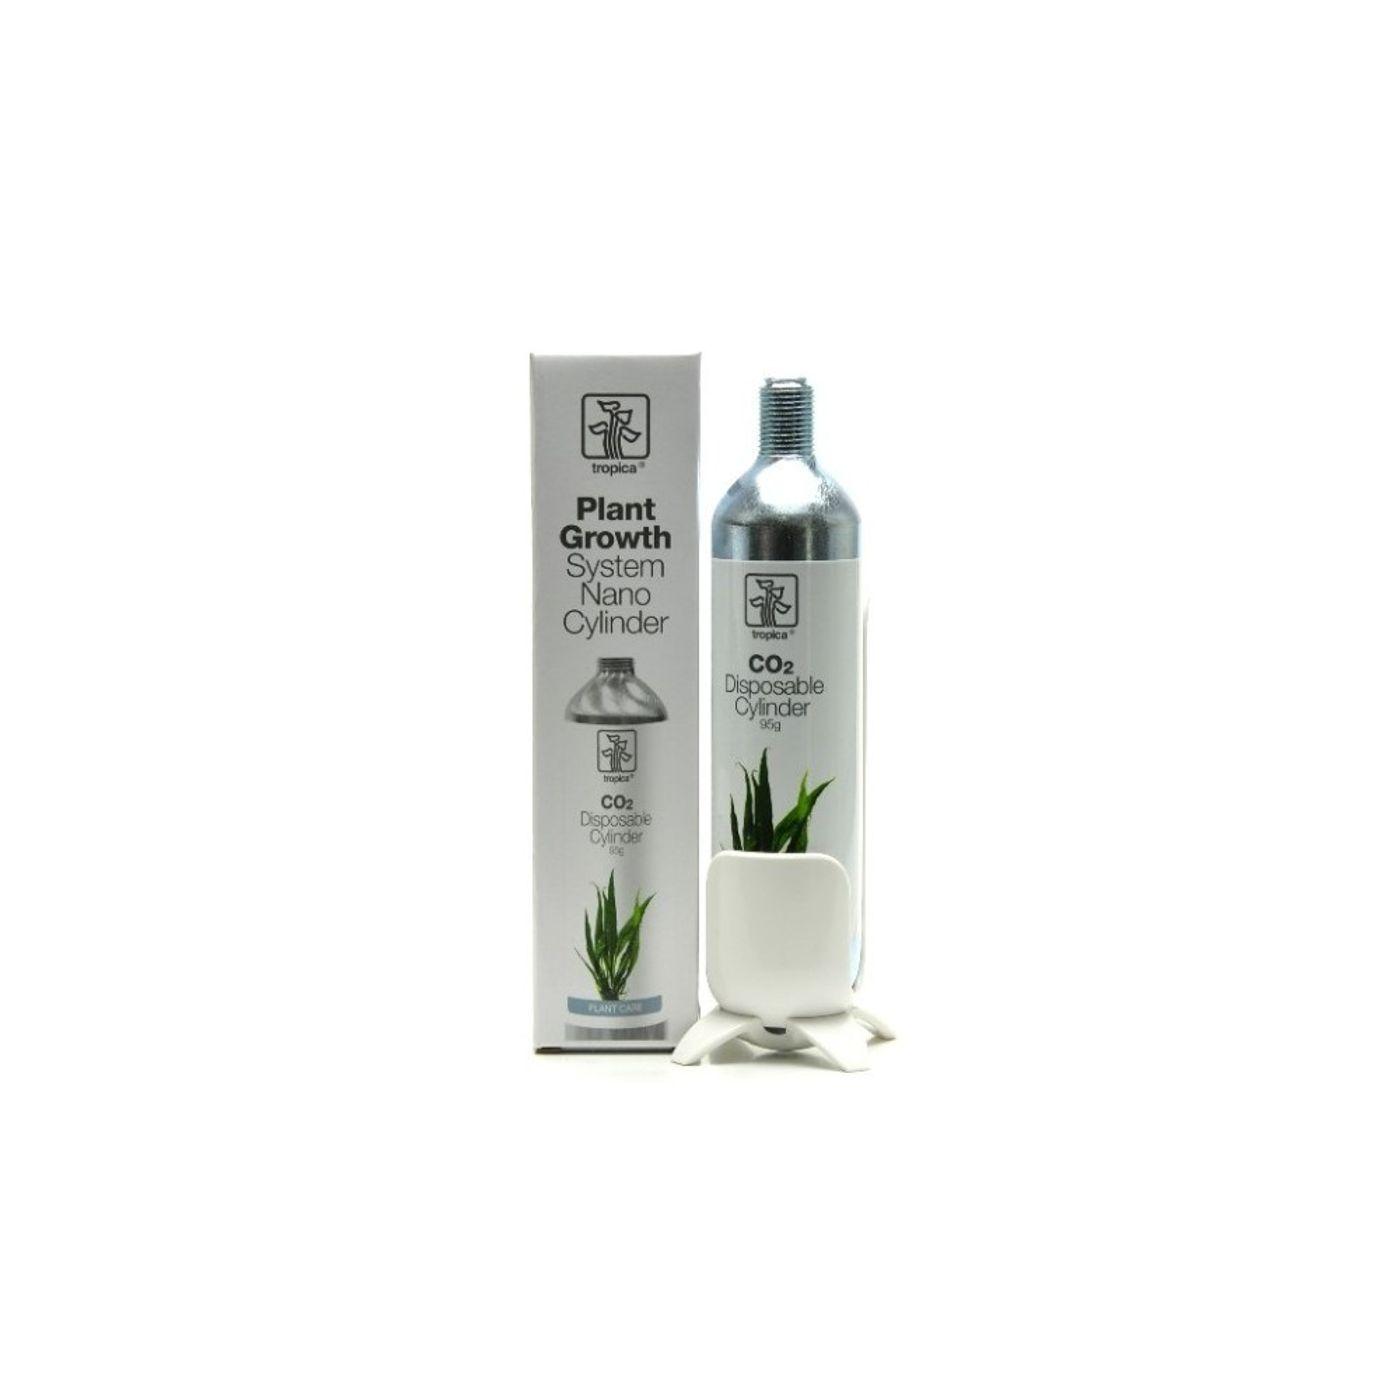 TROPICA-Plant-Growth-System-Nano-Cylinder